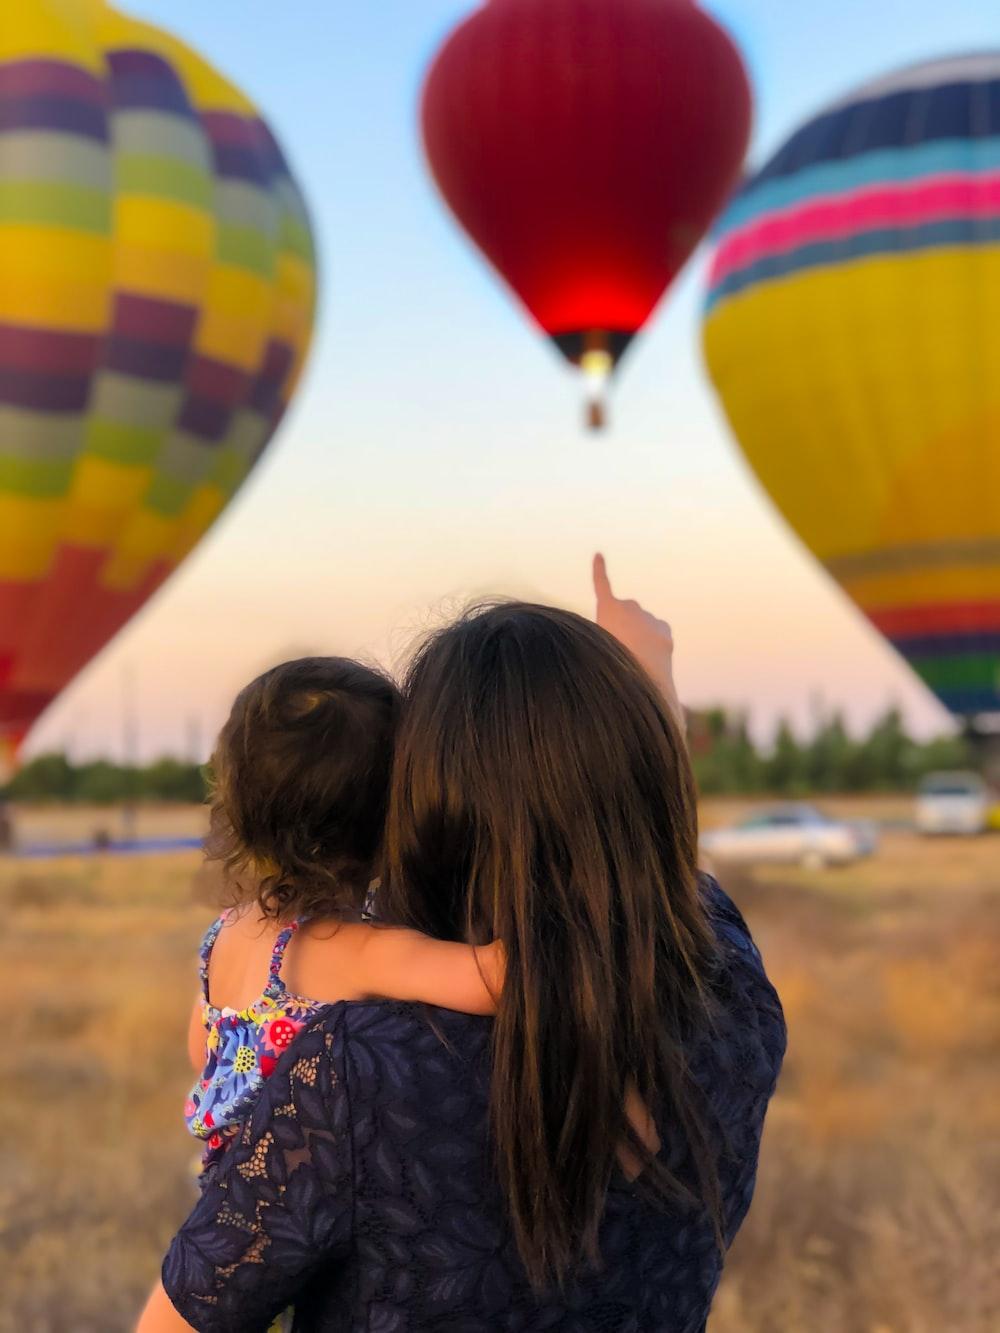 woman carrying toddler point at hot air balloon